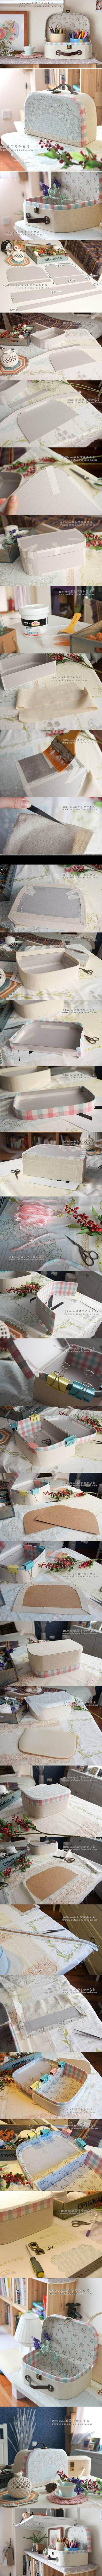 DIY Vintage Cardboard Cosmetic Case | iCreativeIdeas.com Follow Us on Facebook --> https://www.facebook.com/icreativeideas